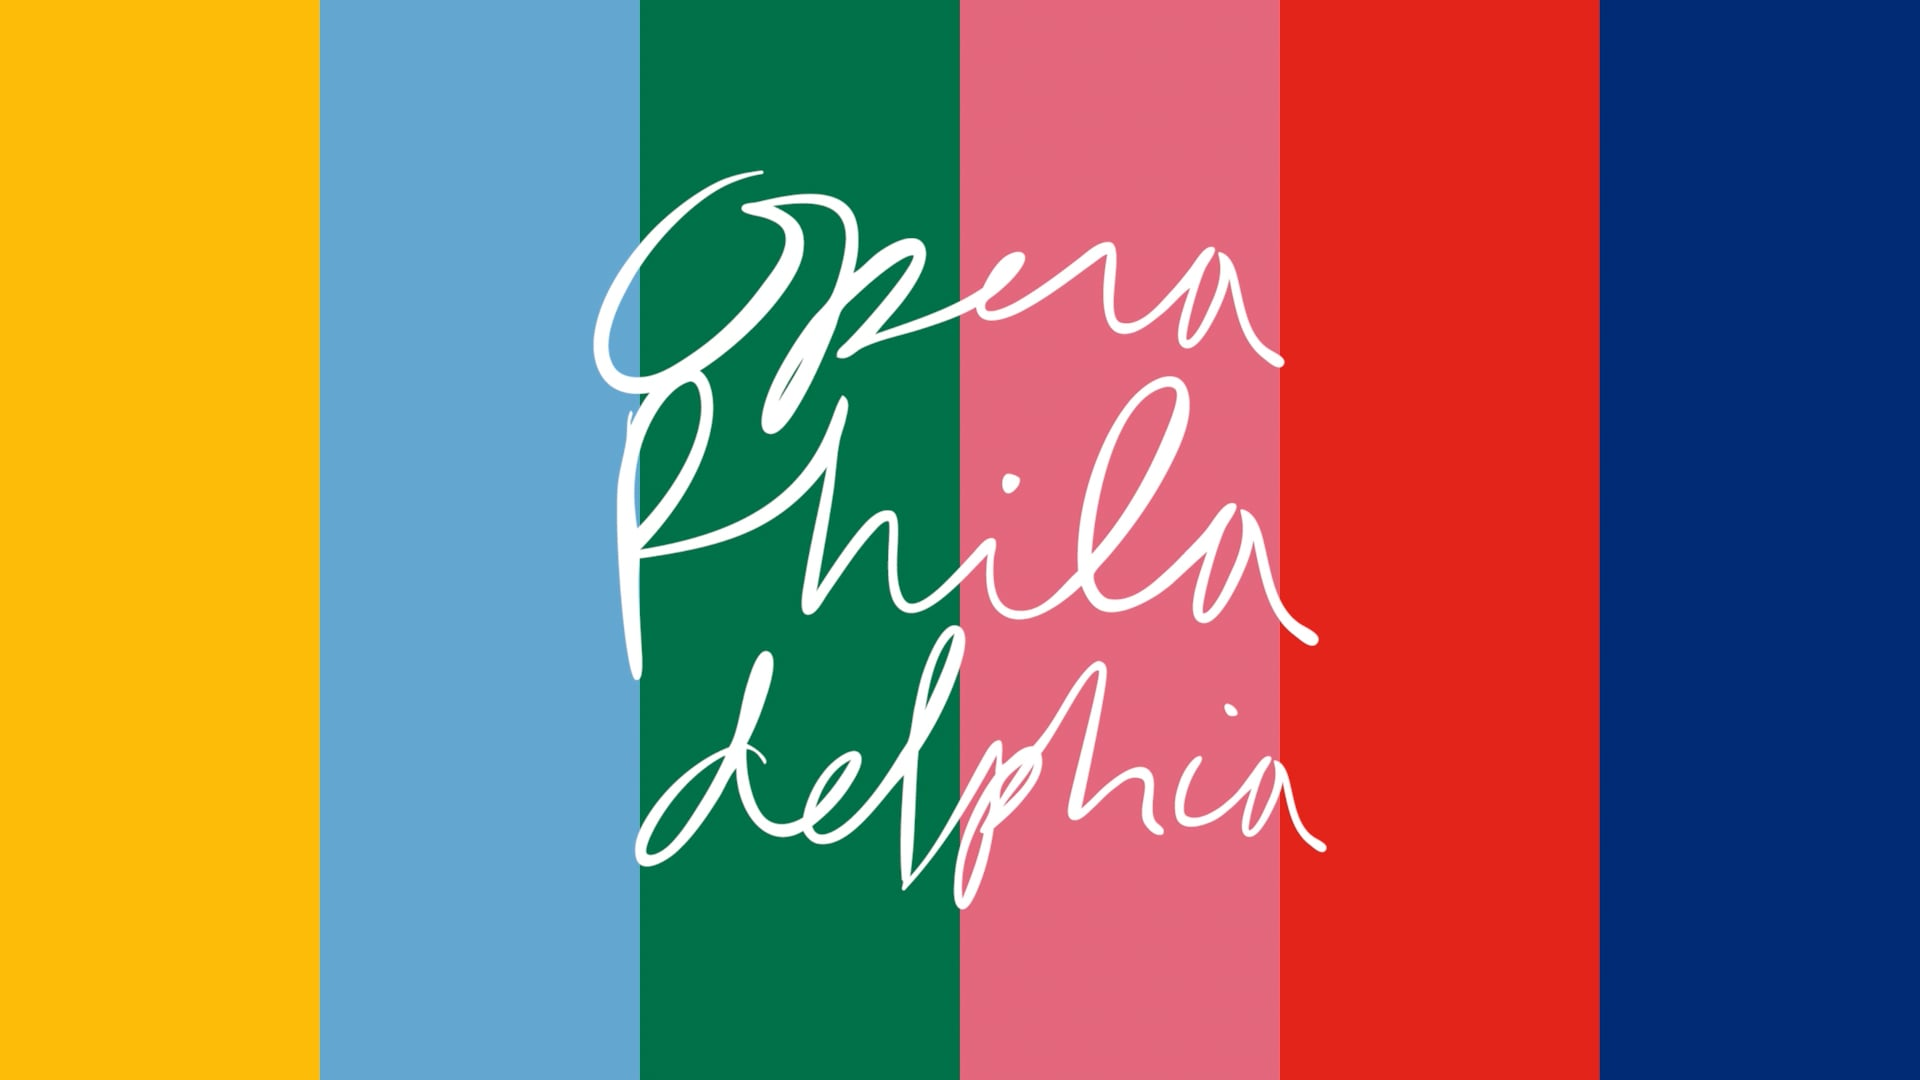 Preview: The Opera Philadelphia Channel